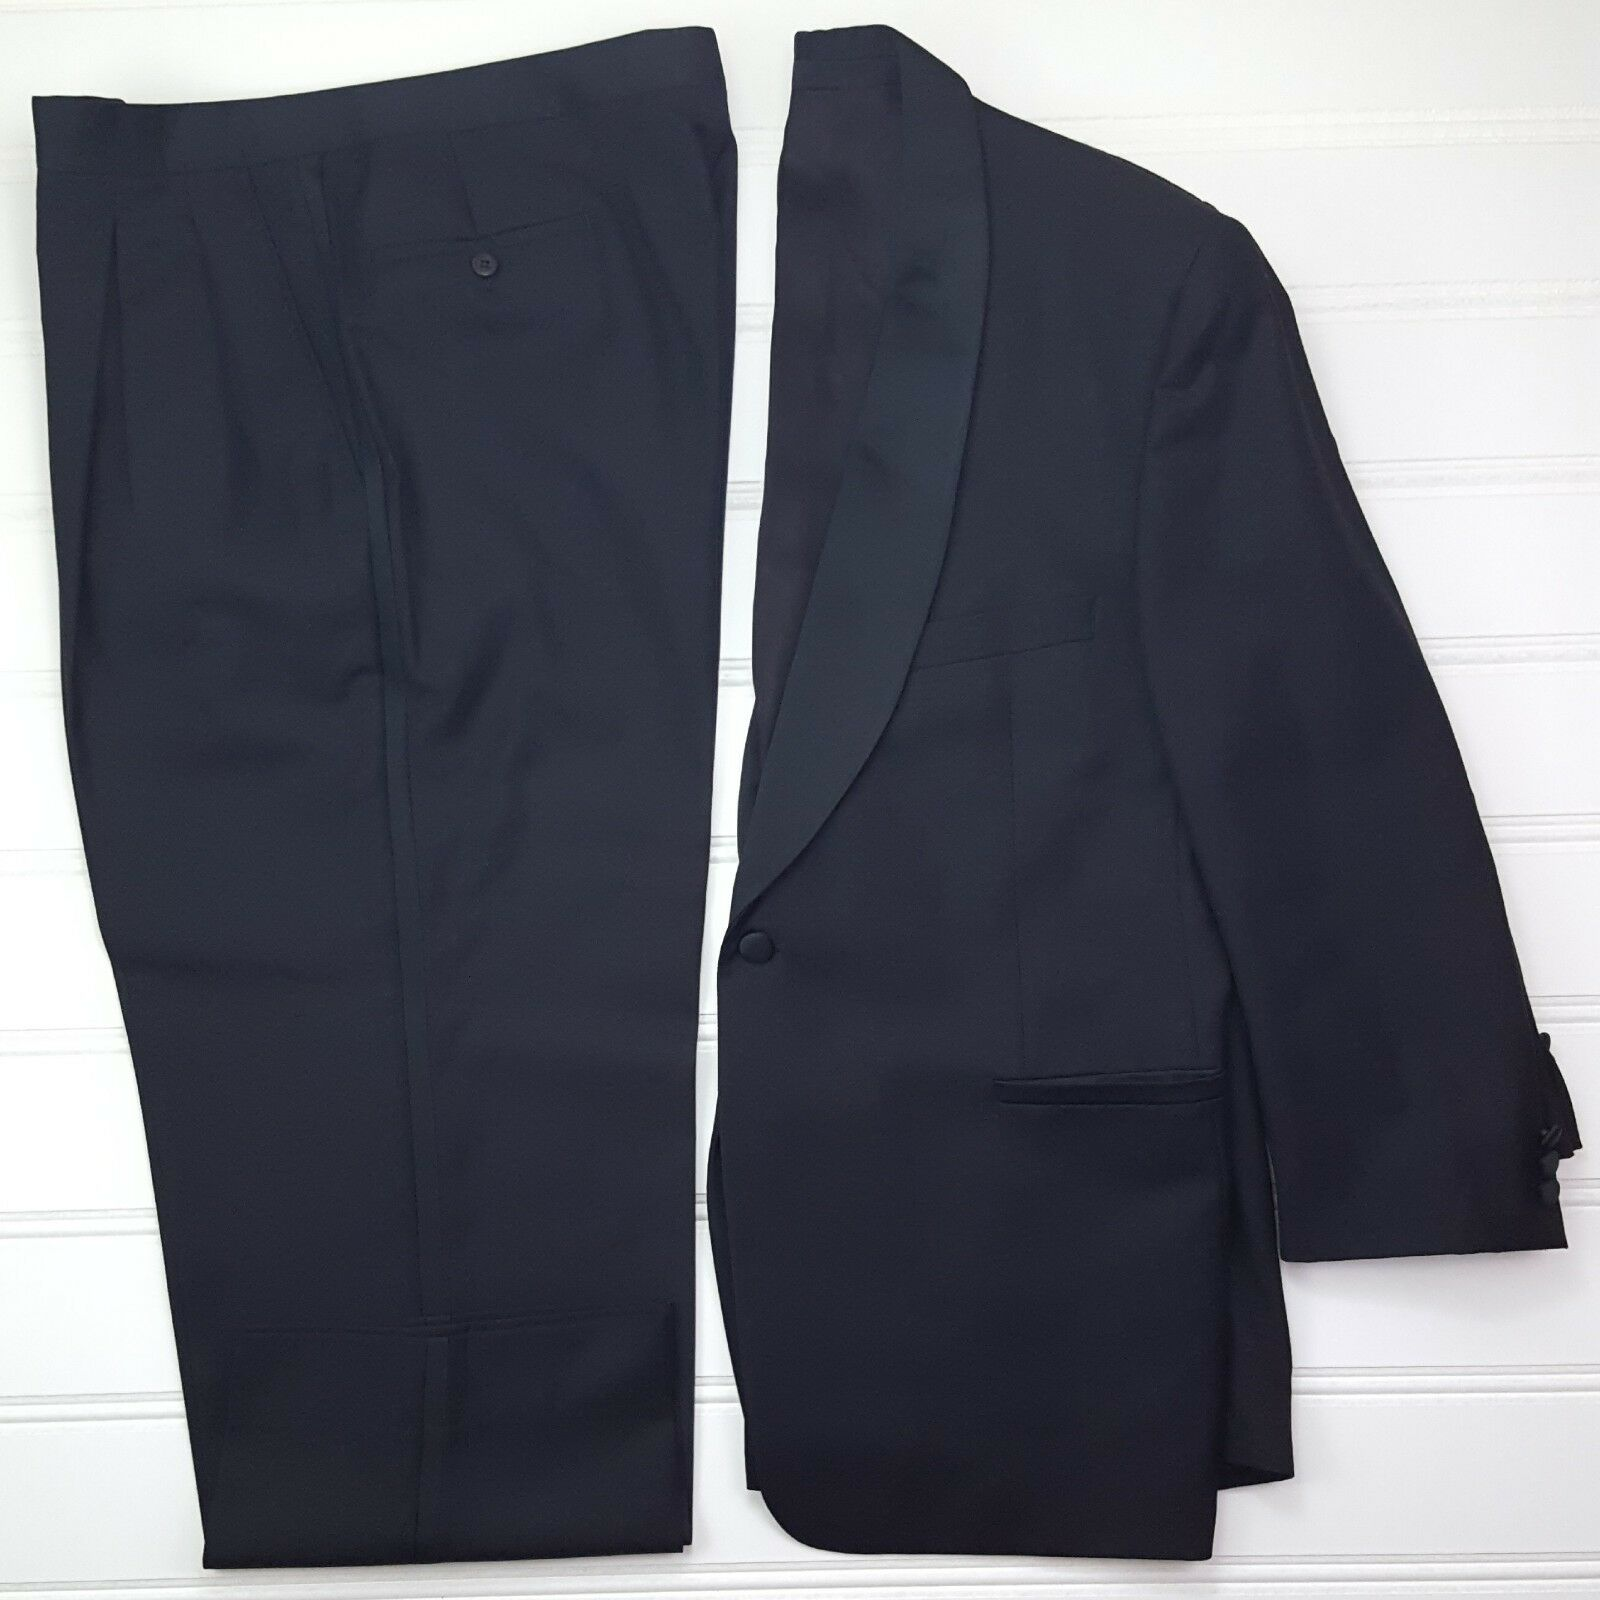 Jhane Barnes Tuxedo 42S Black Chevron Pattern No Vent 1 Button Mens Size Wedding